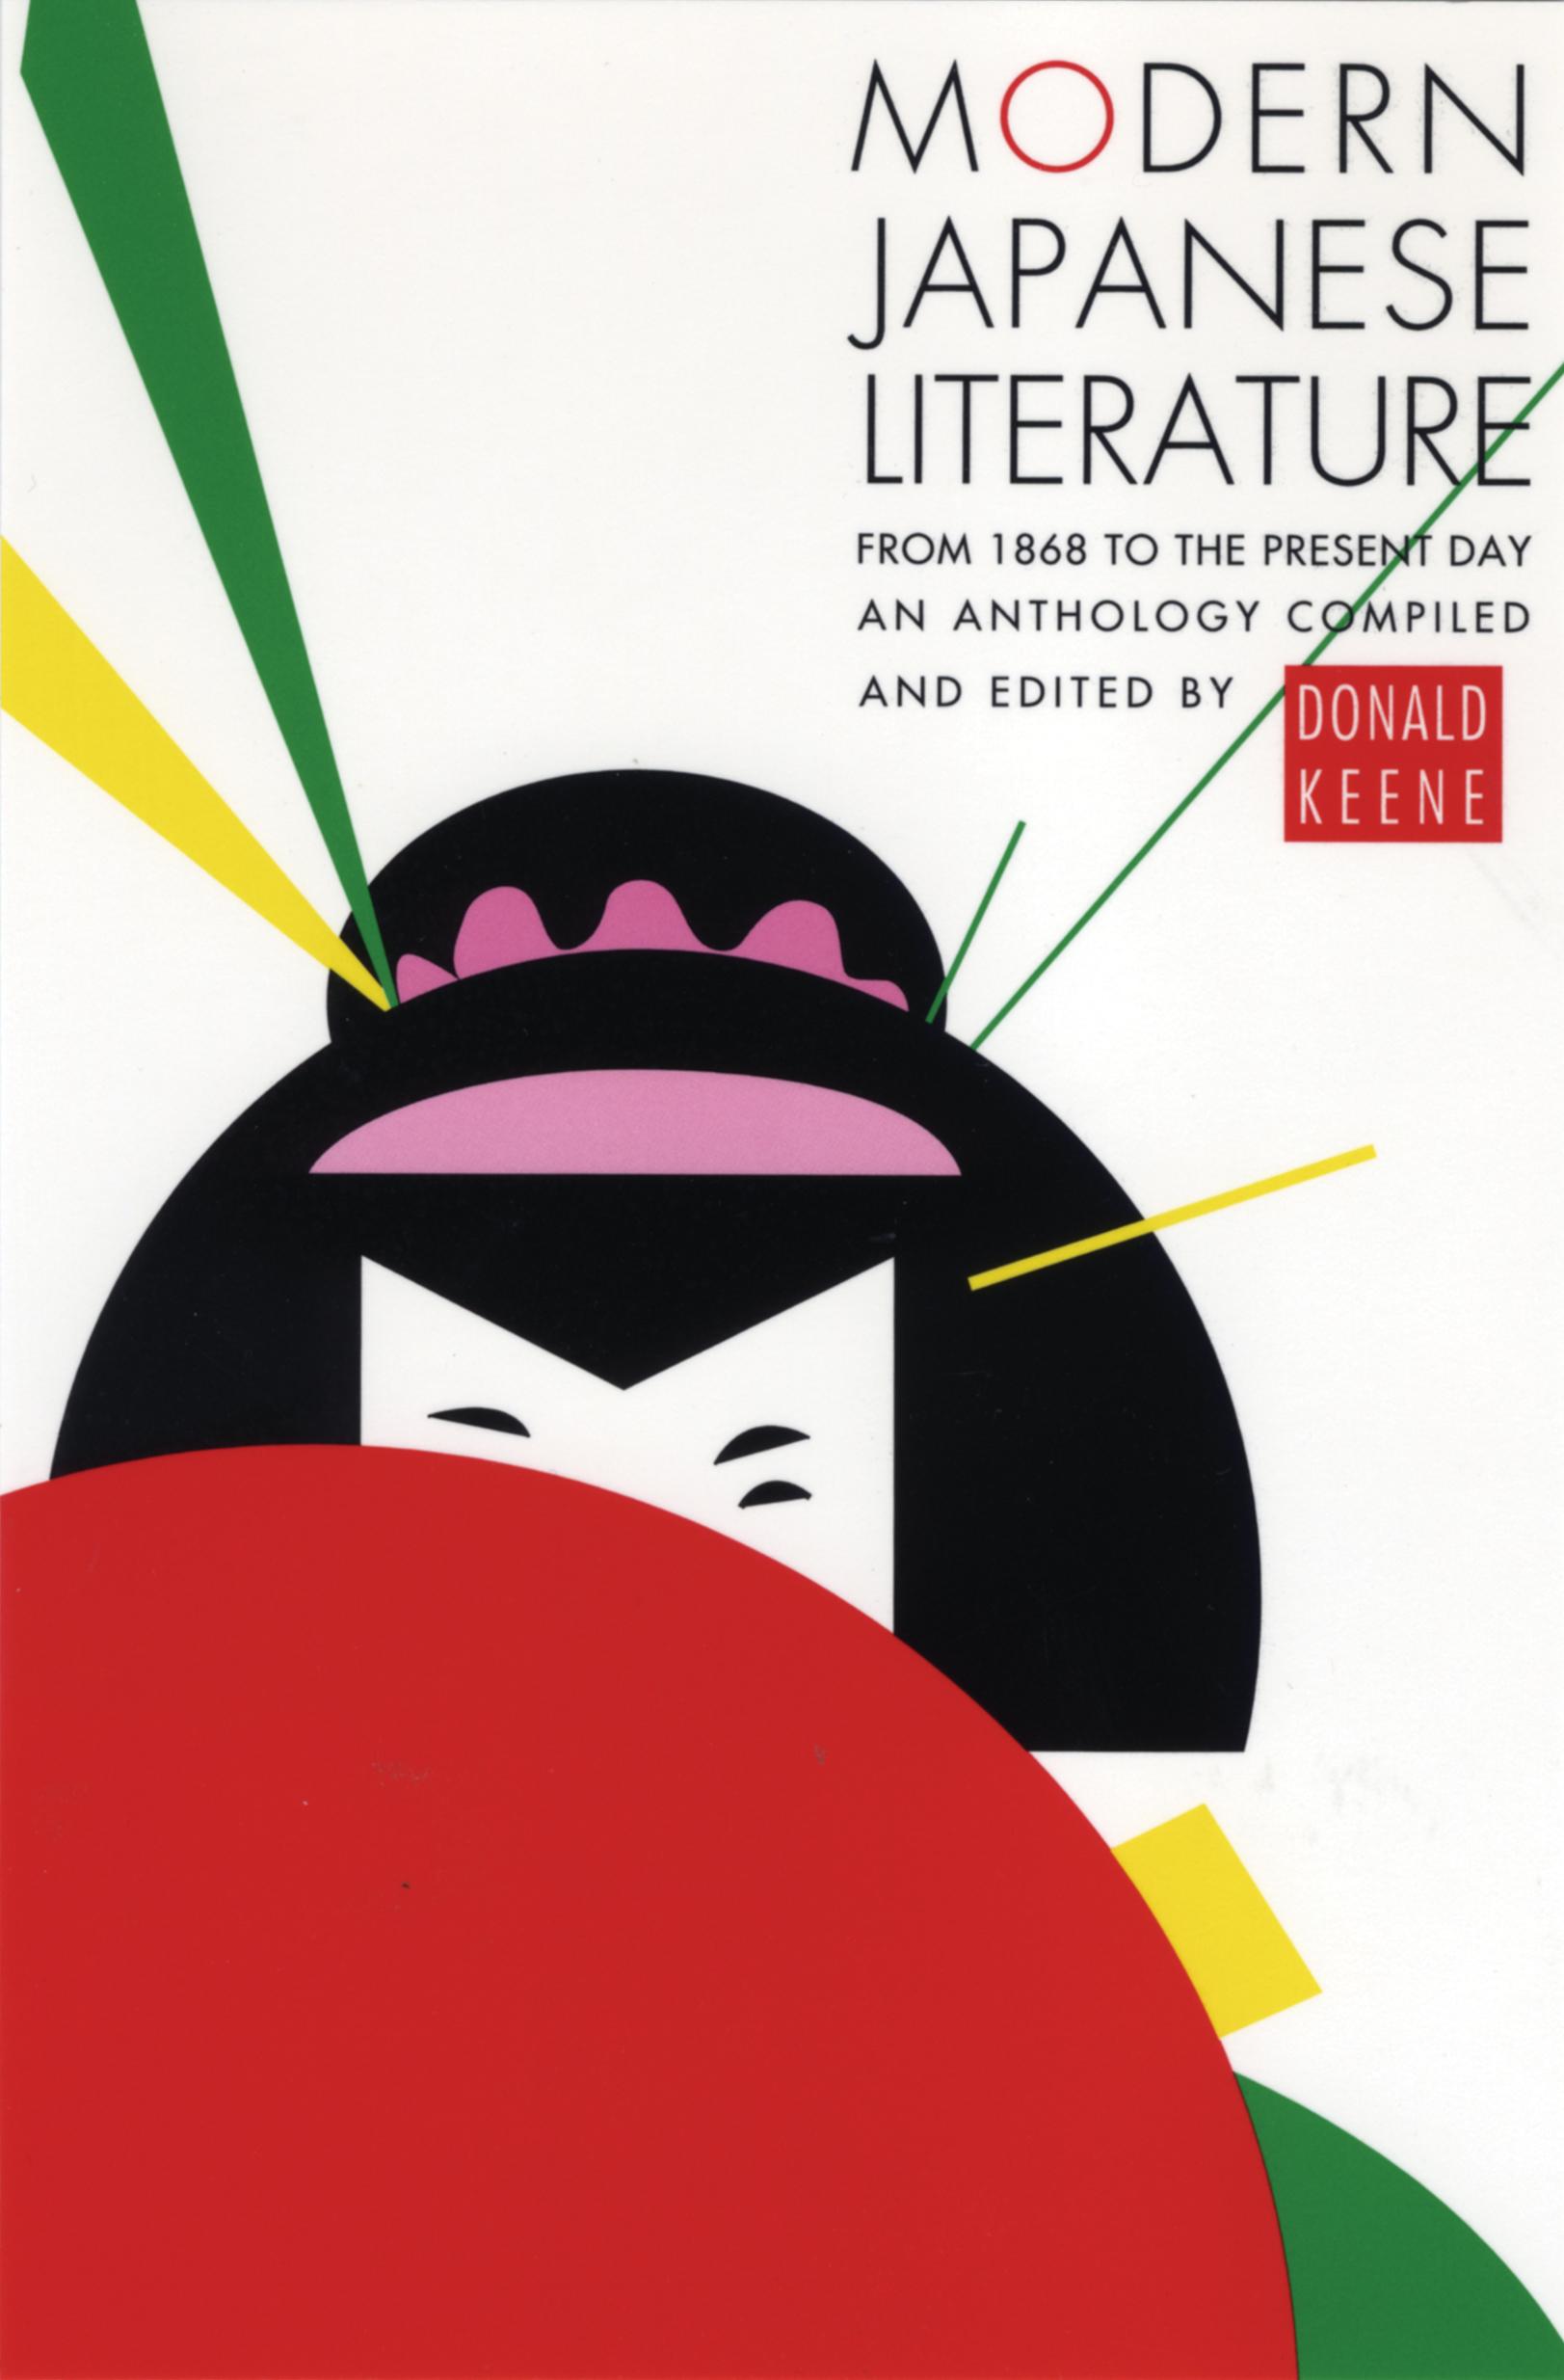 Modern Japanese Literature by Donald Keene.